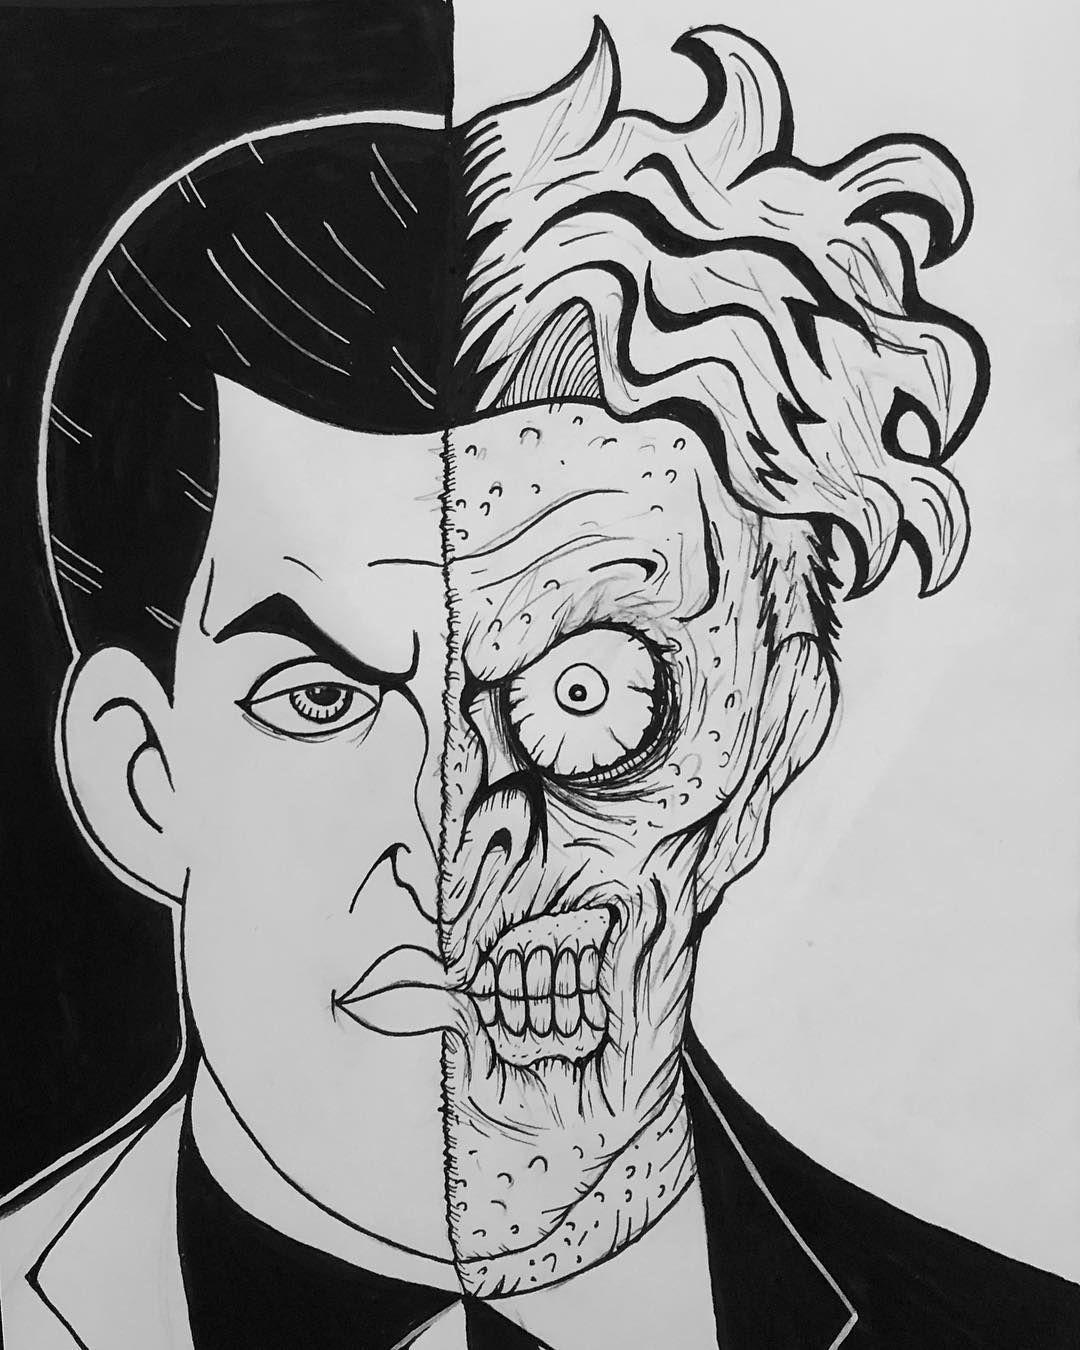 Two faces #twoface #harveydent #batman #batmantattoo #comics #cartoons #animated #90s #warnerbrosstudios #arkhamasylum #gangster #gangsta #gangstatattoo #scarface #theworldisyours #sides #drawing #draw